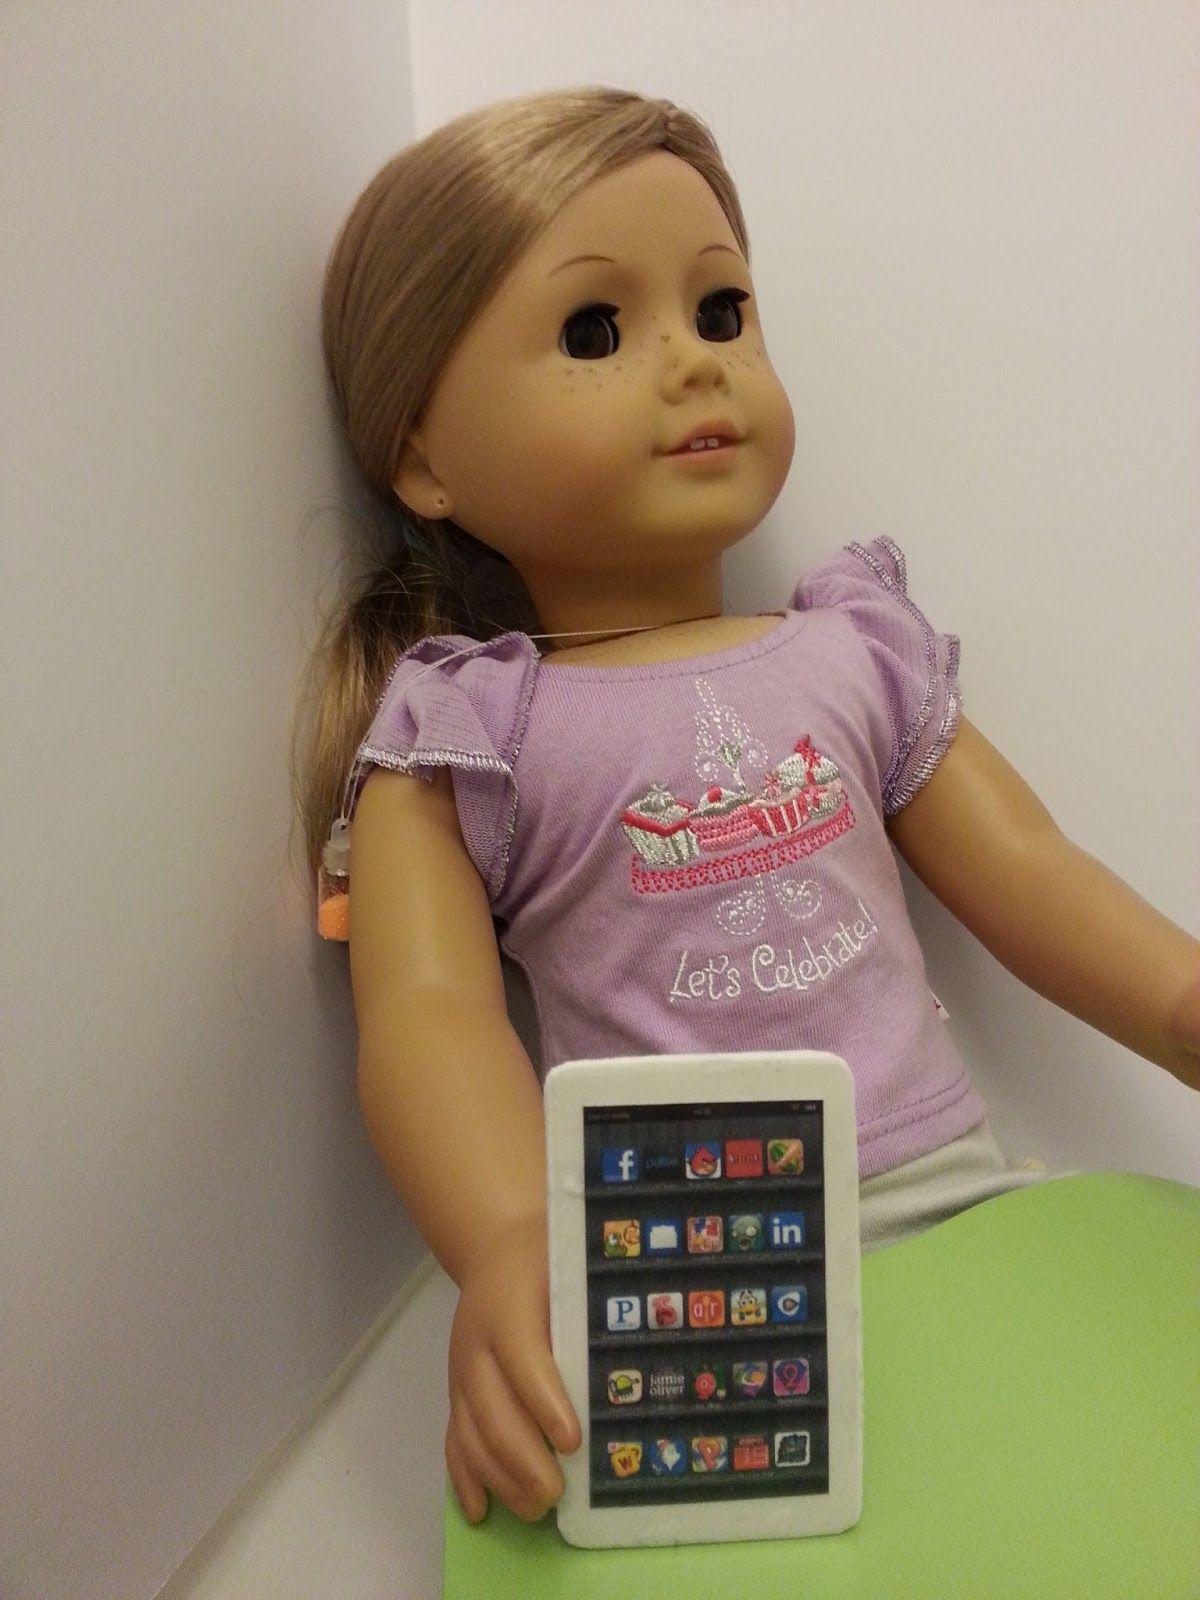 39 American Girl Doll Diys That Won T Break The Bank Things For 18